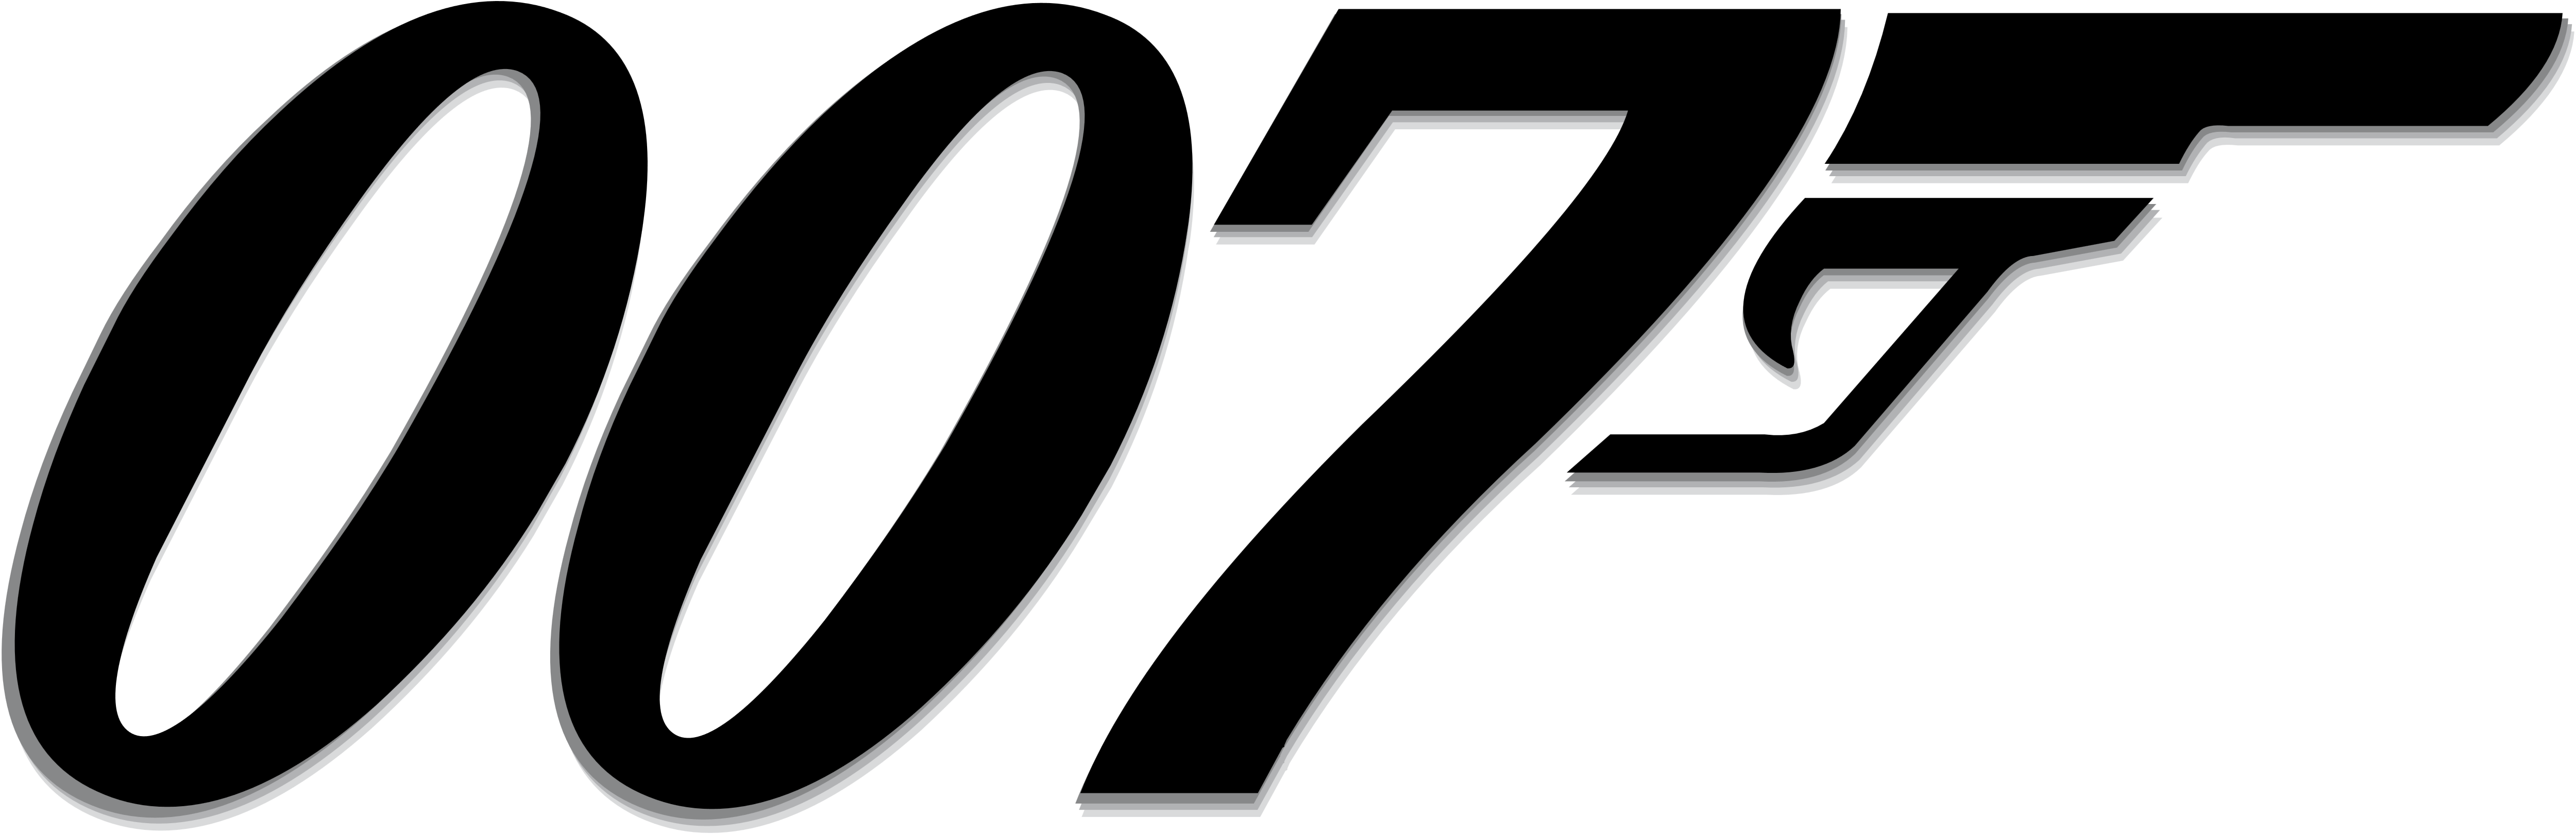 5000x1619 James Bond 007 Logos Download